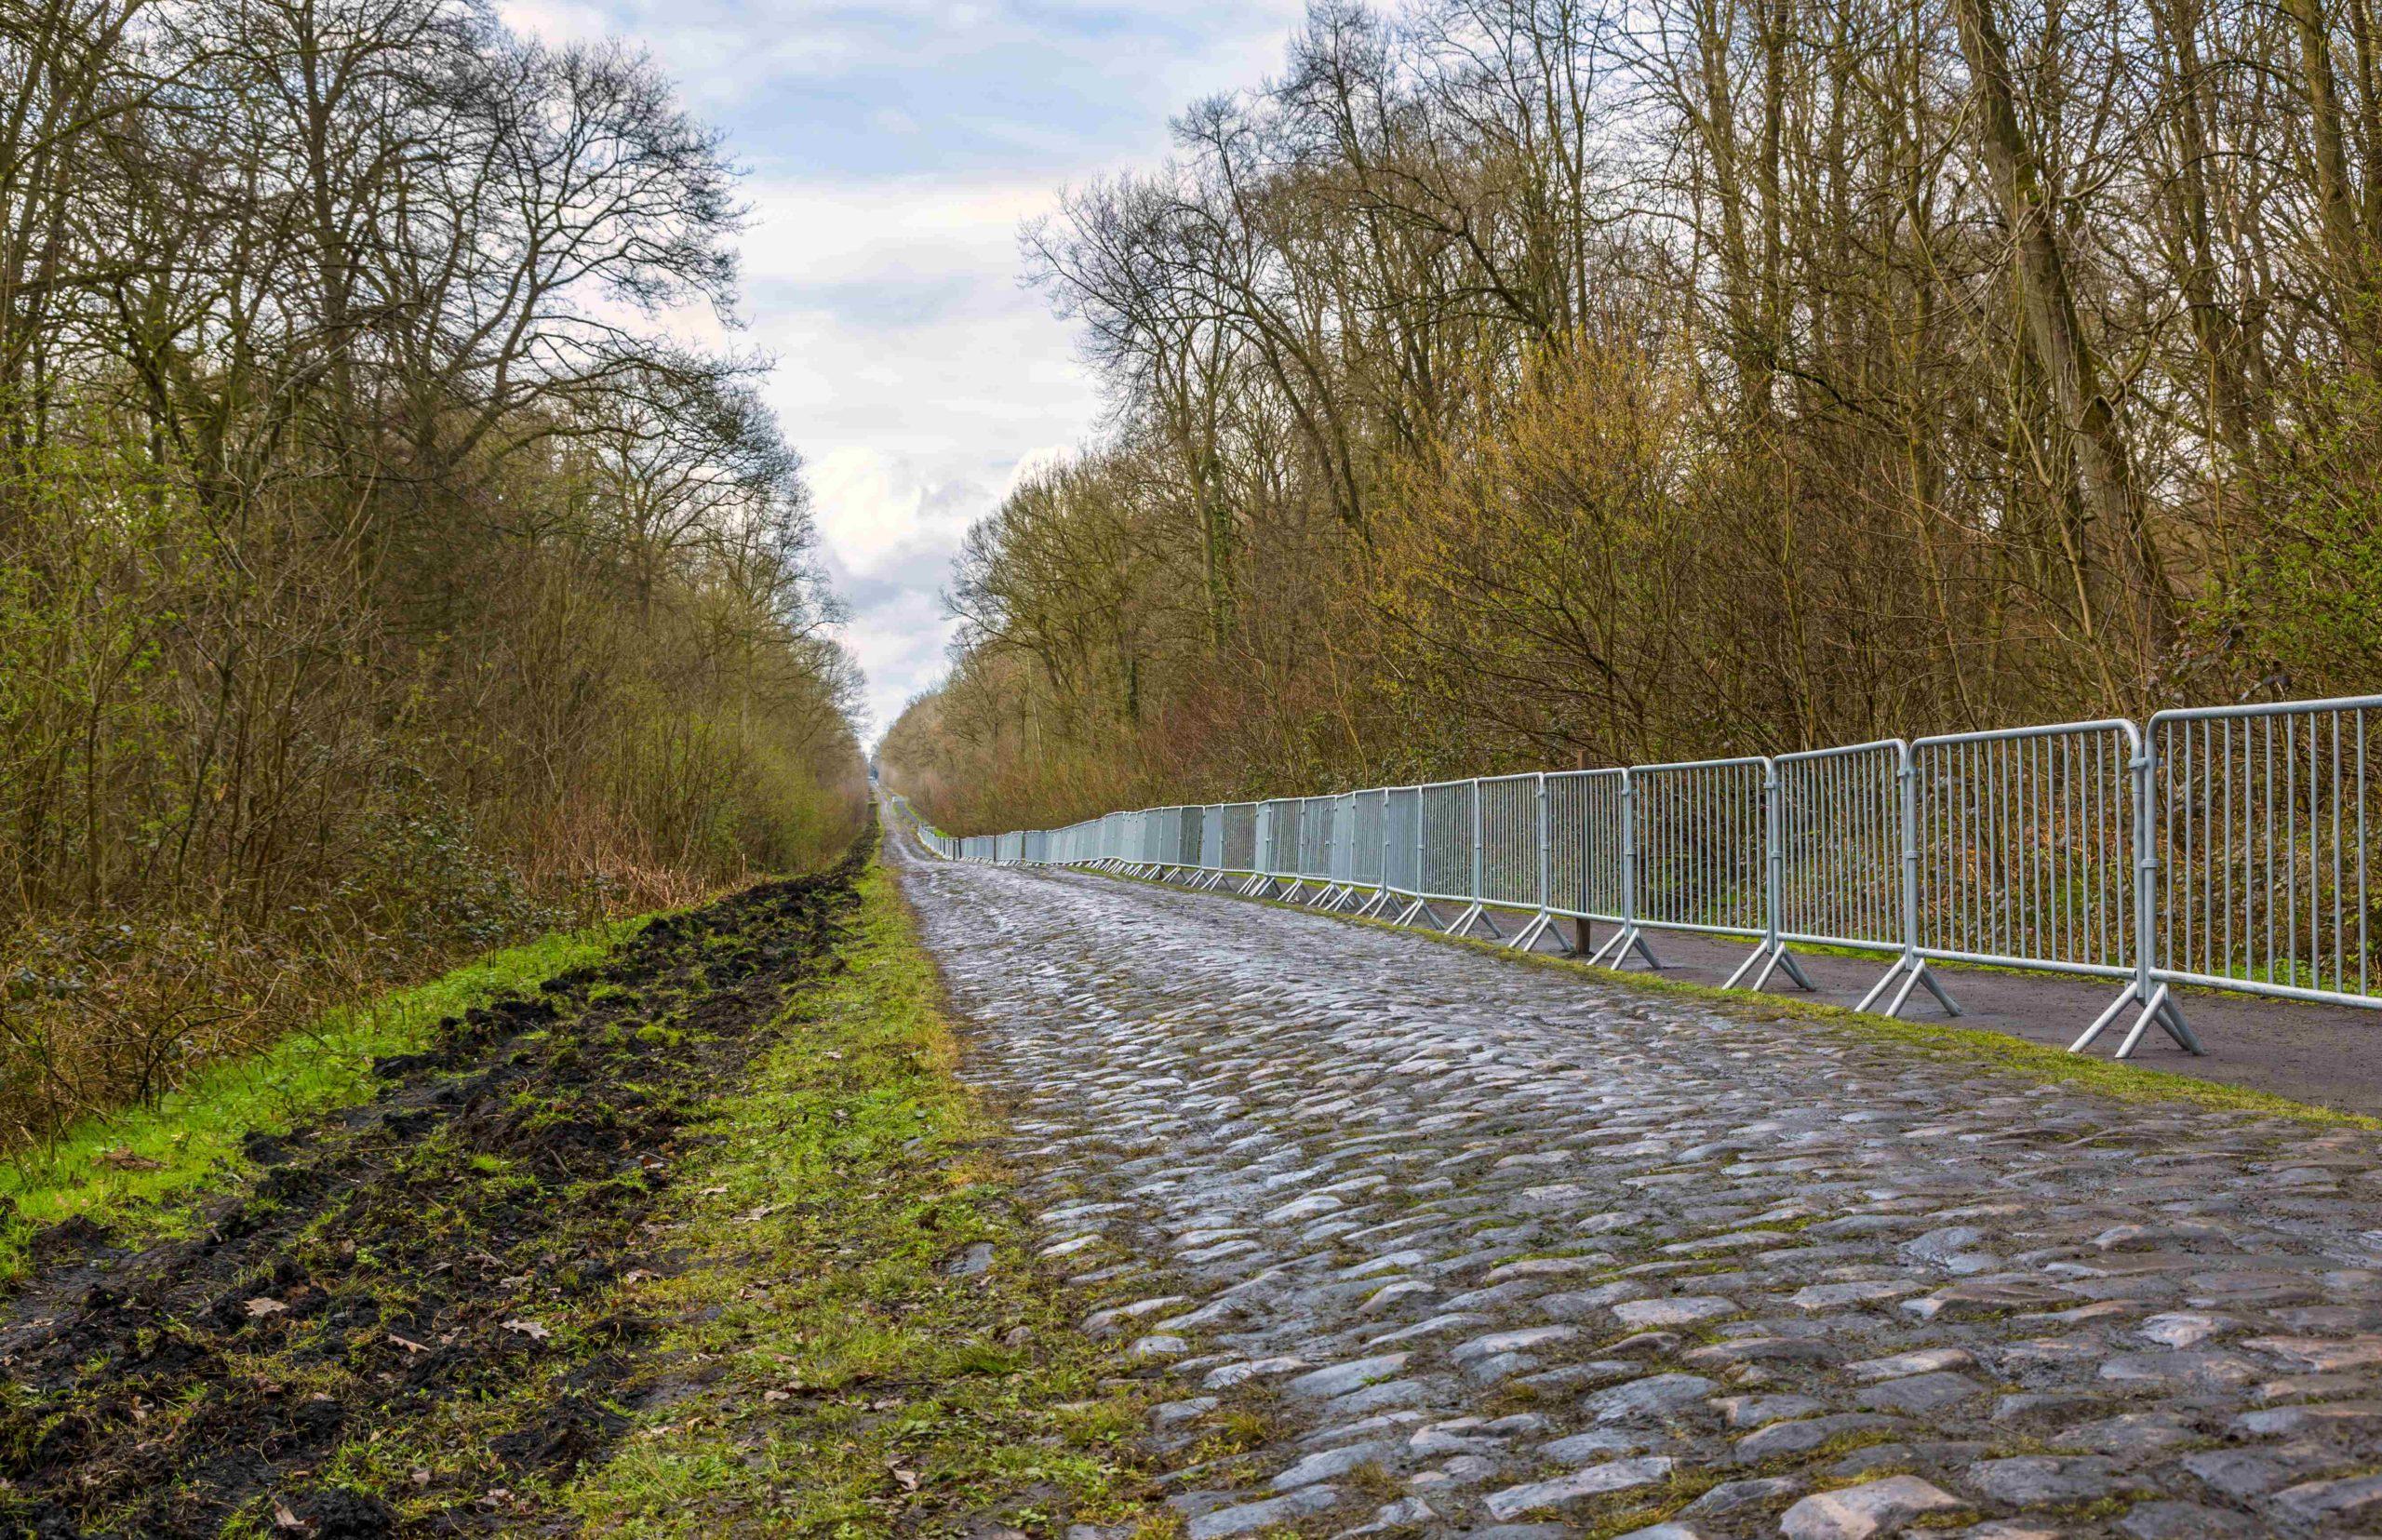 Paris-Roubaix Challenge 2021